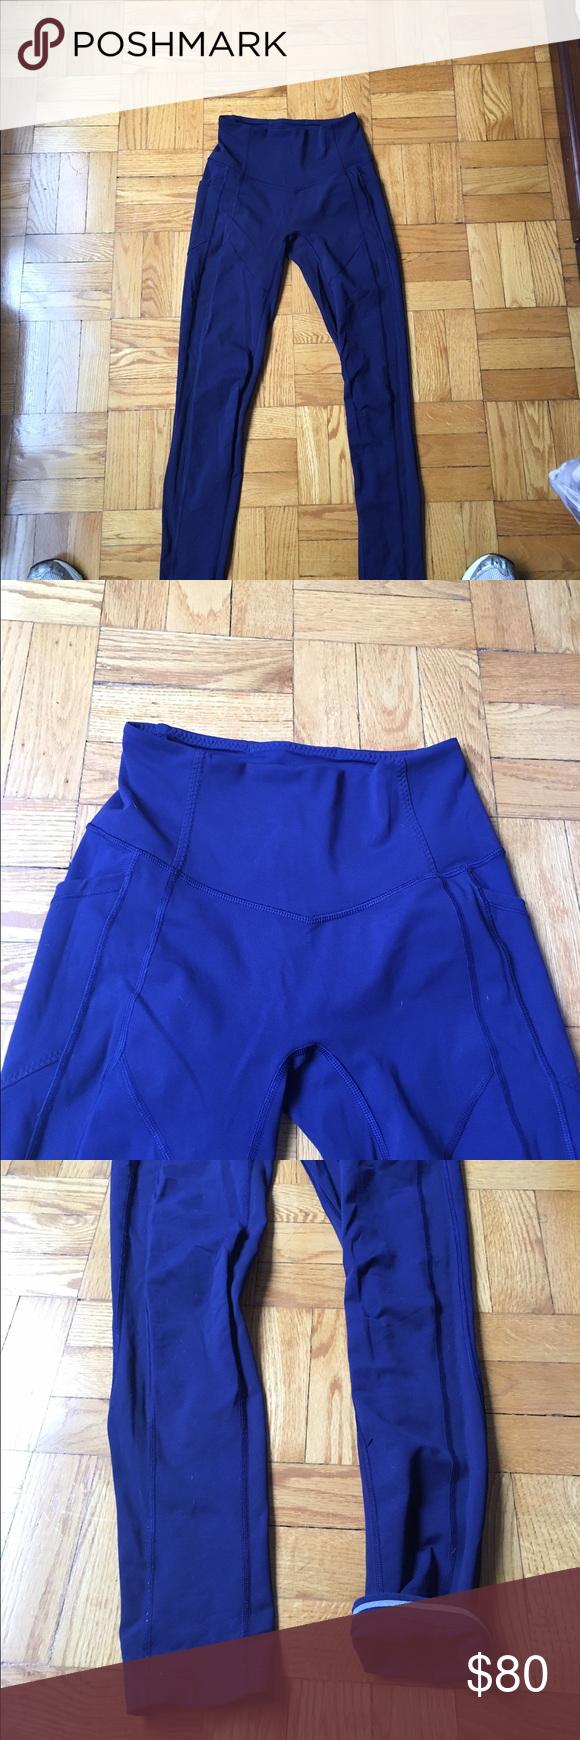 Lululemon sz 4 navy leggings. Worn once. Lululemon sz 4 navy leggings. Worn once. Too small for me. lululemon athletica Pants Leggings